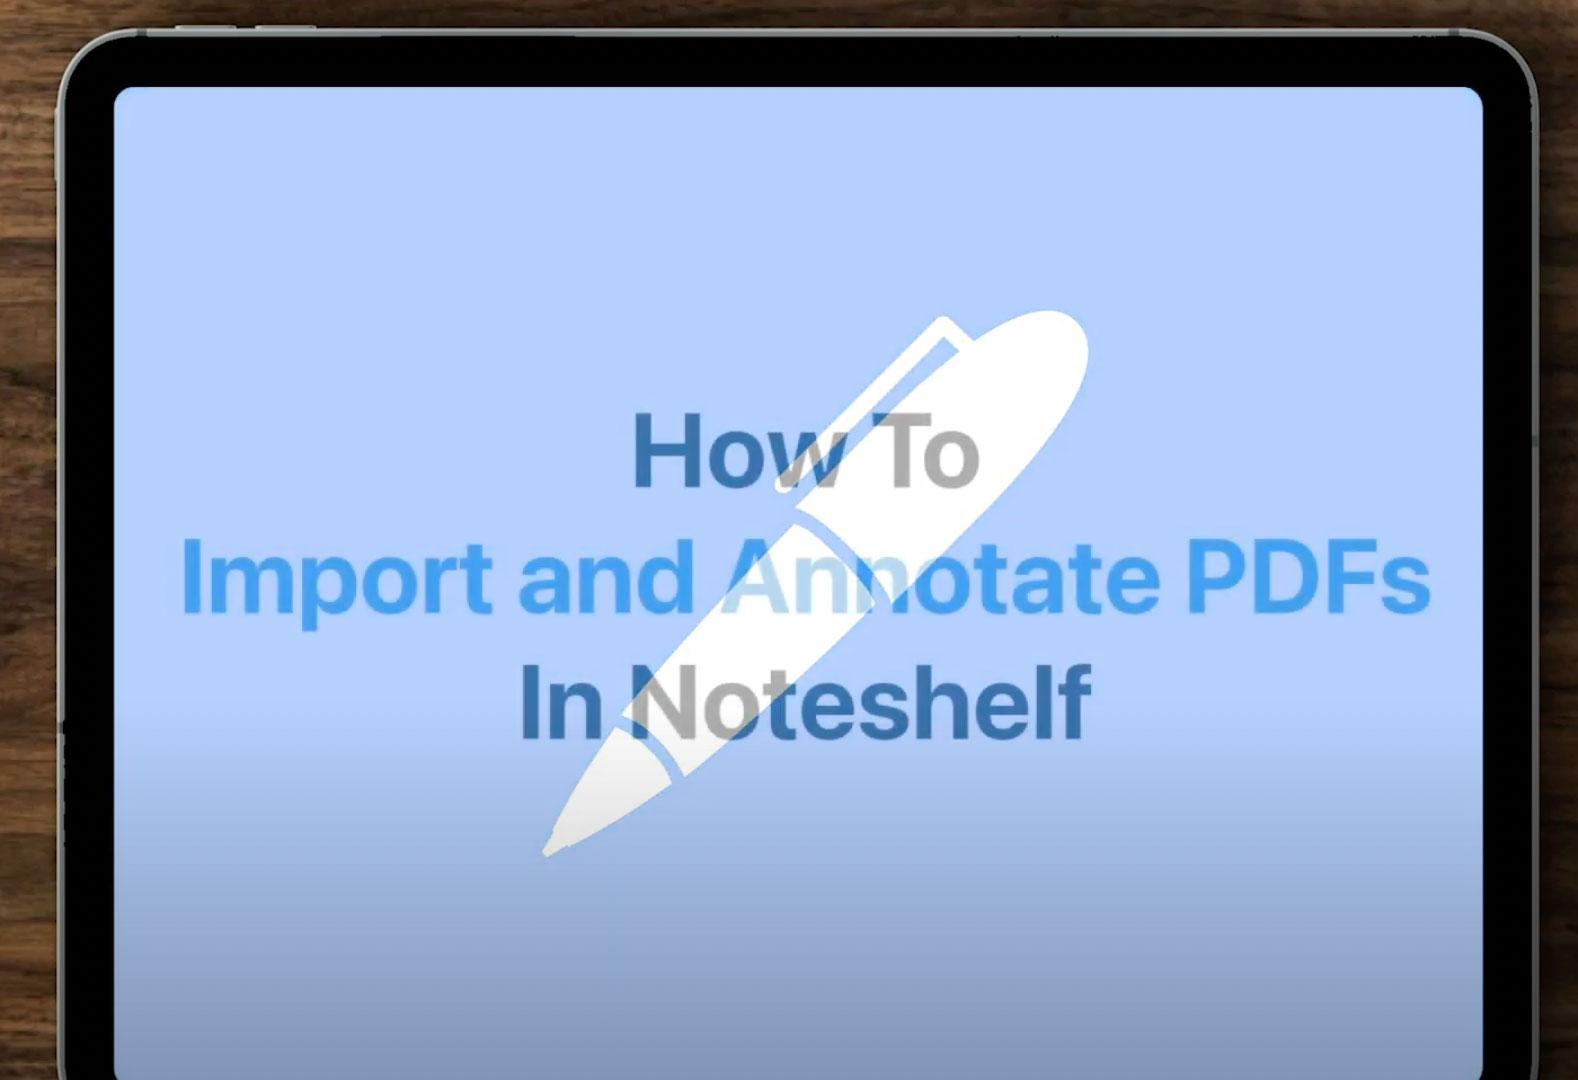 How-To-Import-PDF-INTO-Noteshelf